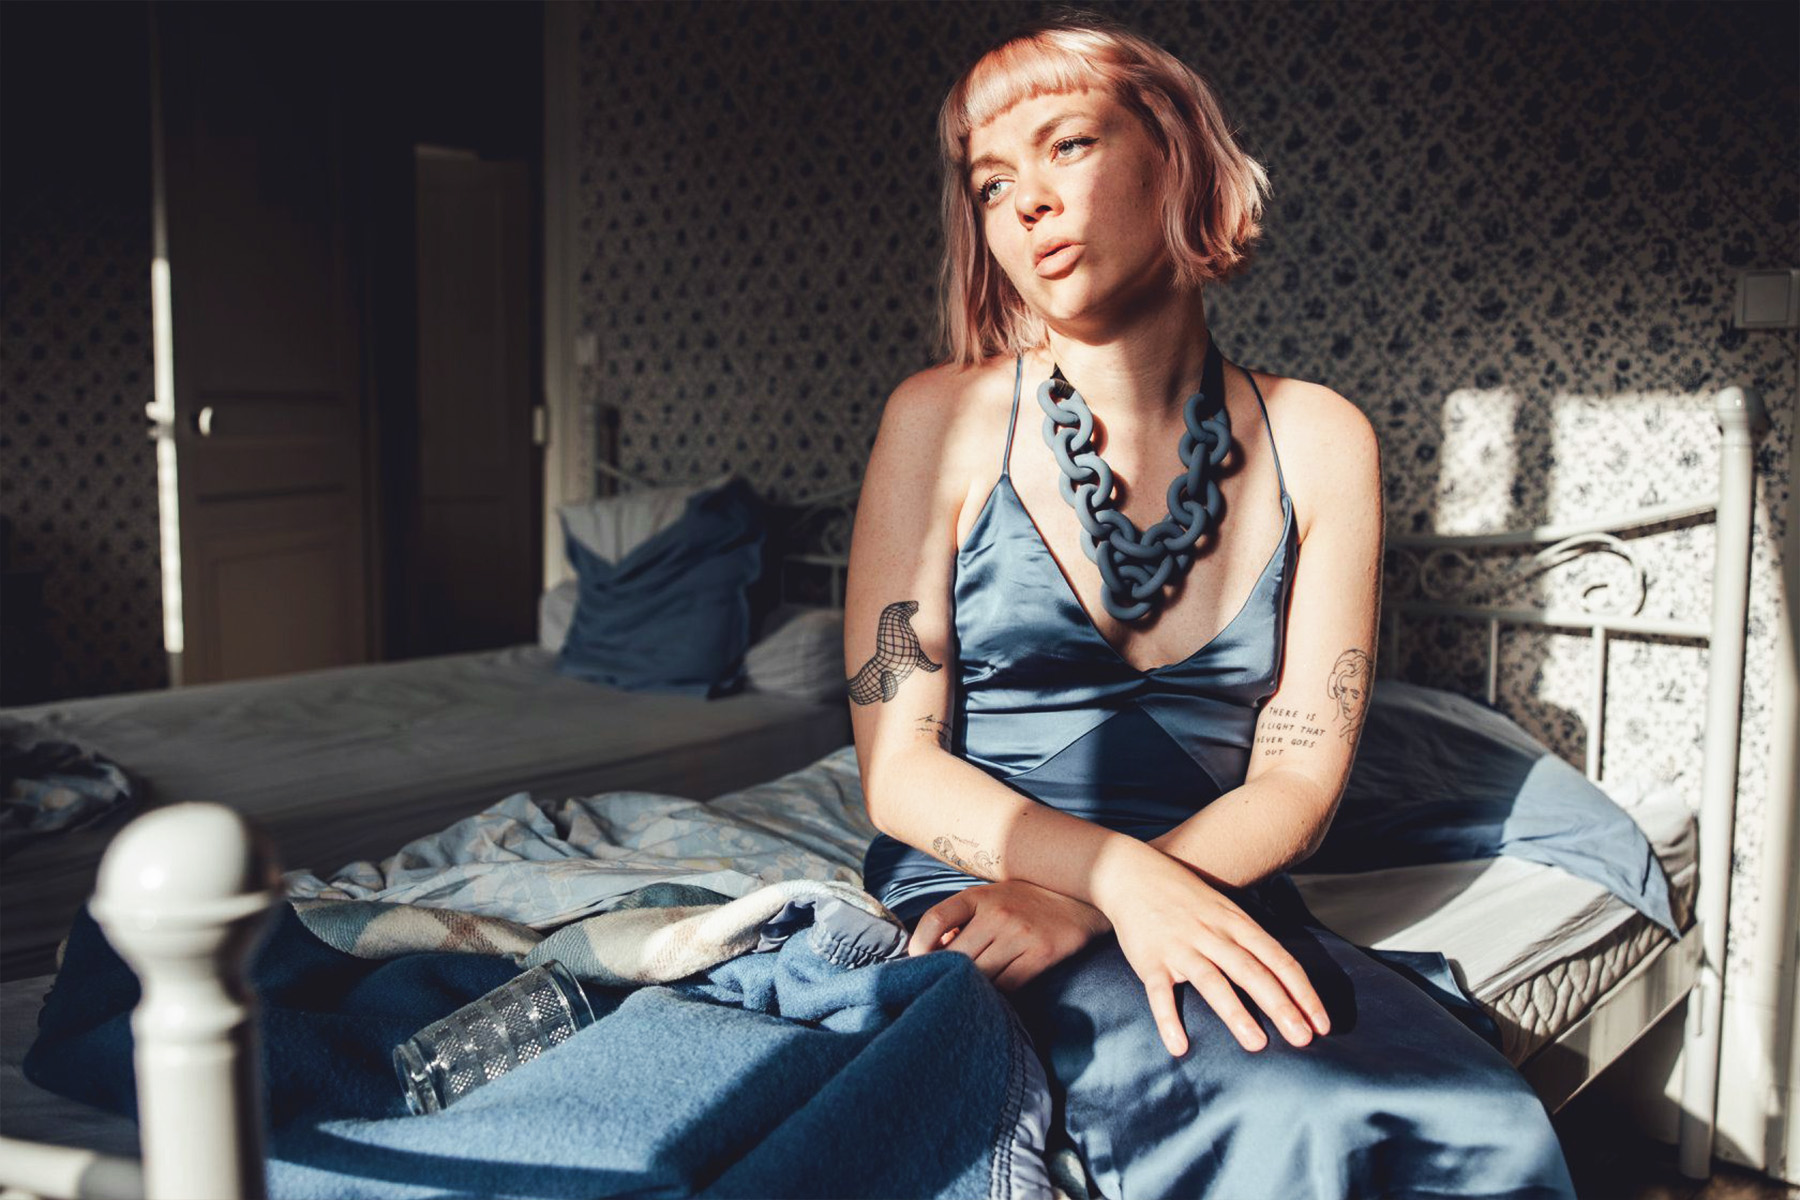 kleiderei koeln 6 artikel – ©Kleiderei